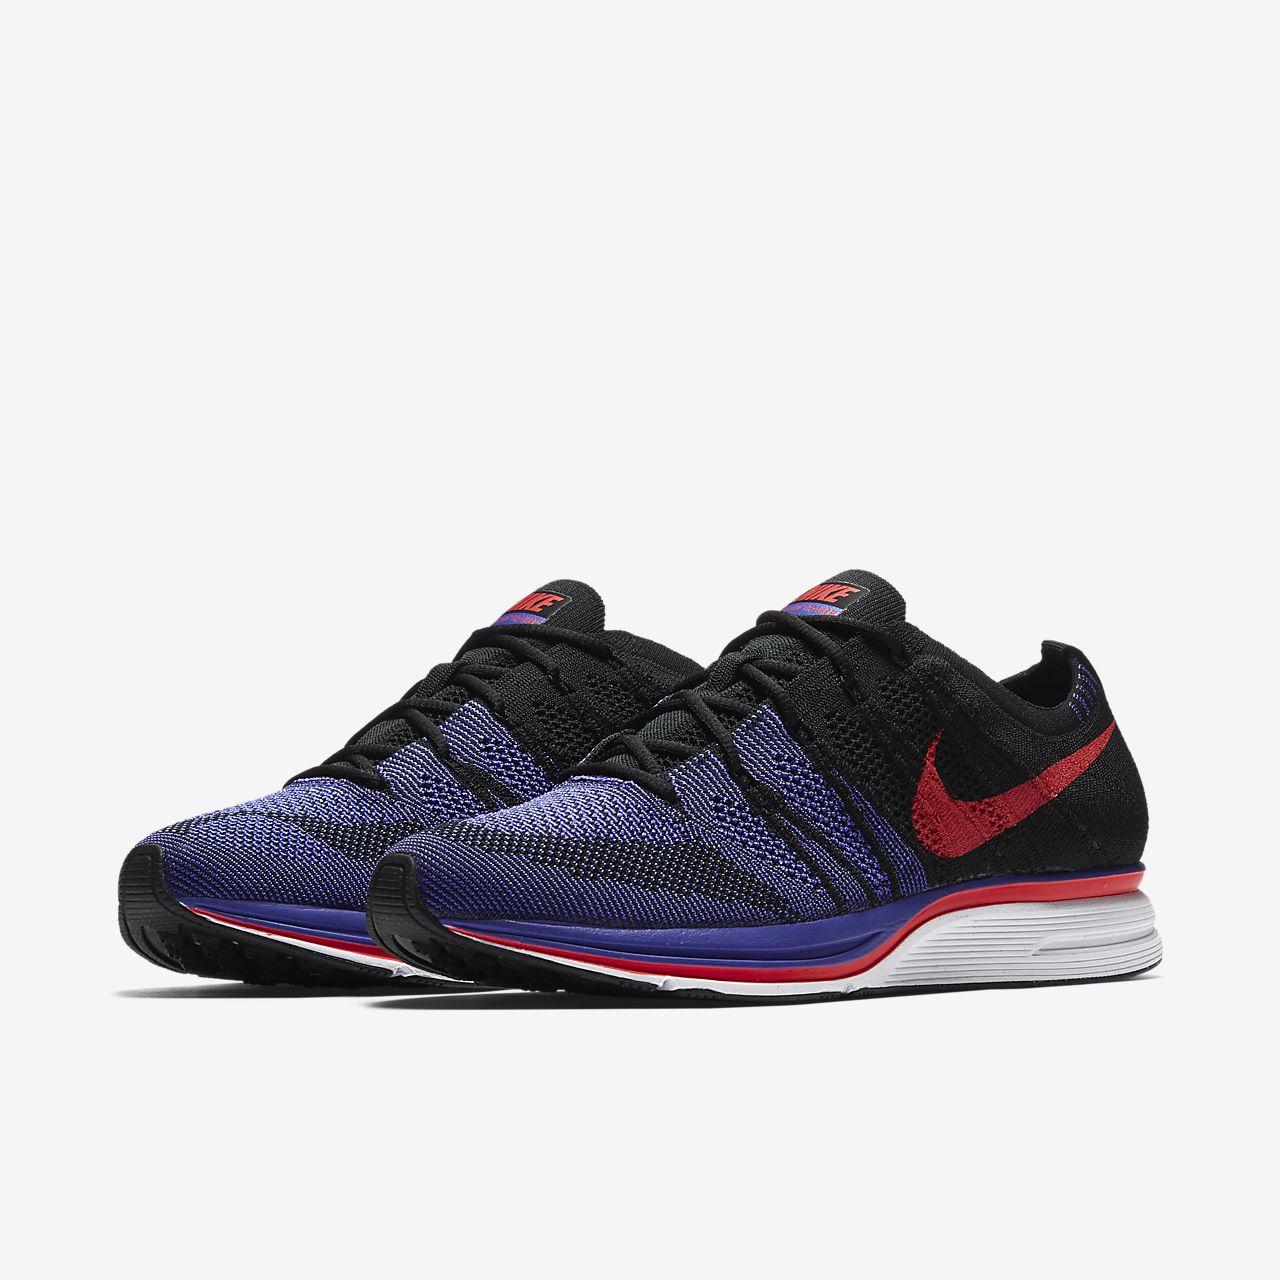 san francisco ed914 9a0b9 ... Scarpa Nike Flyknit Trainer - Unisex